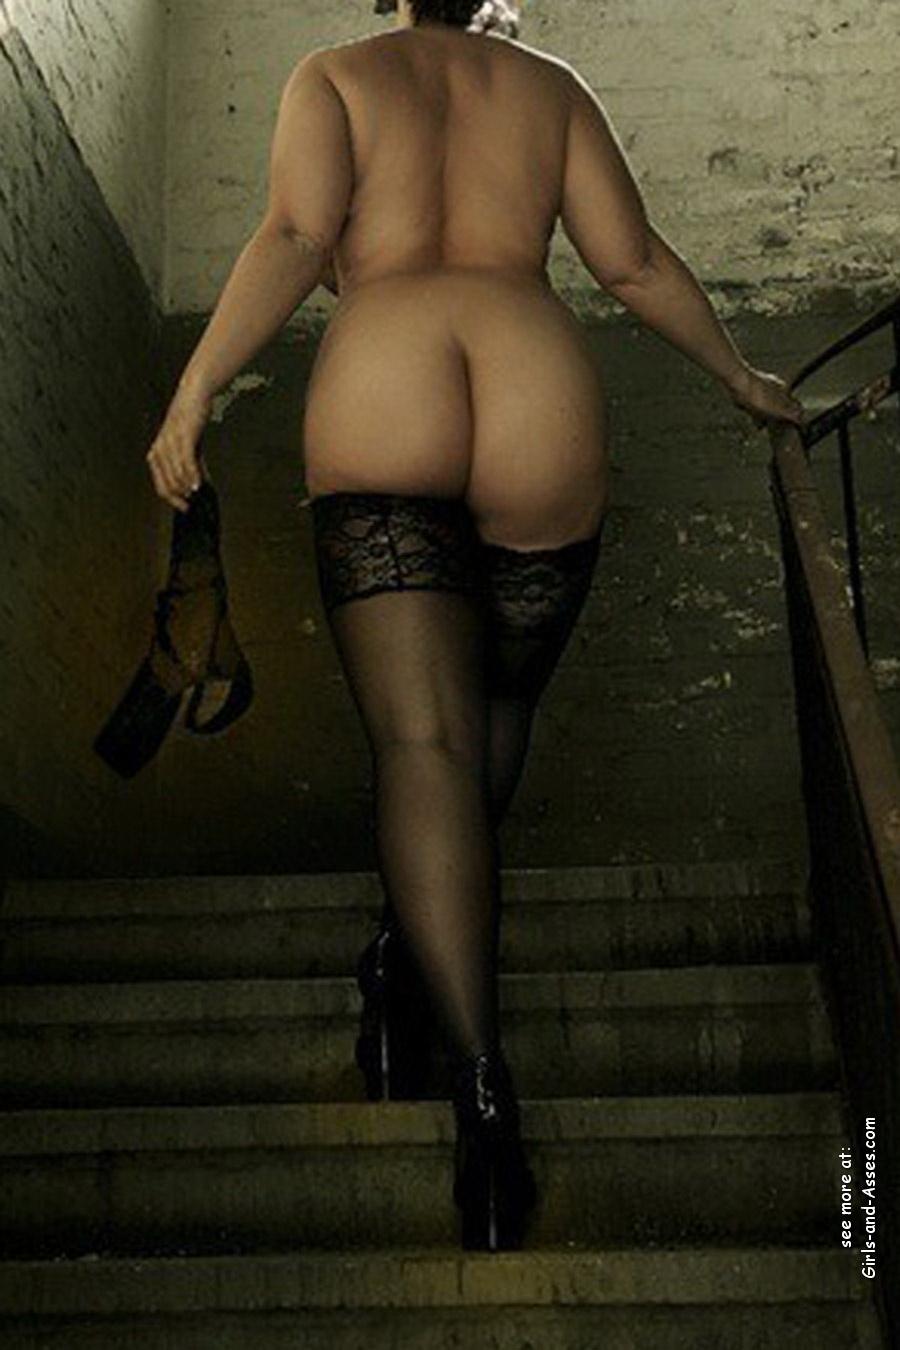 nude female backside in public photo 01543